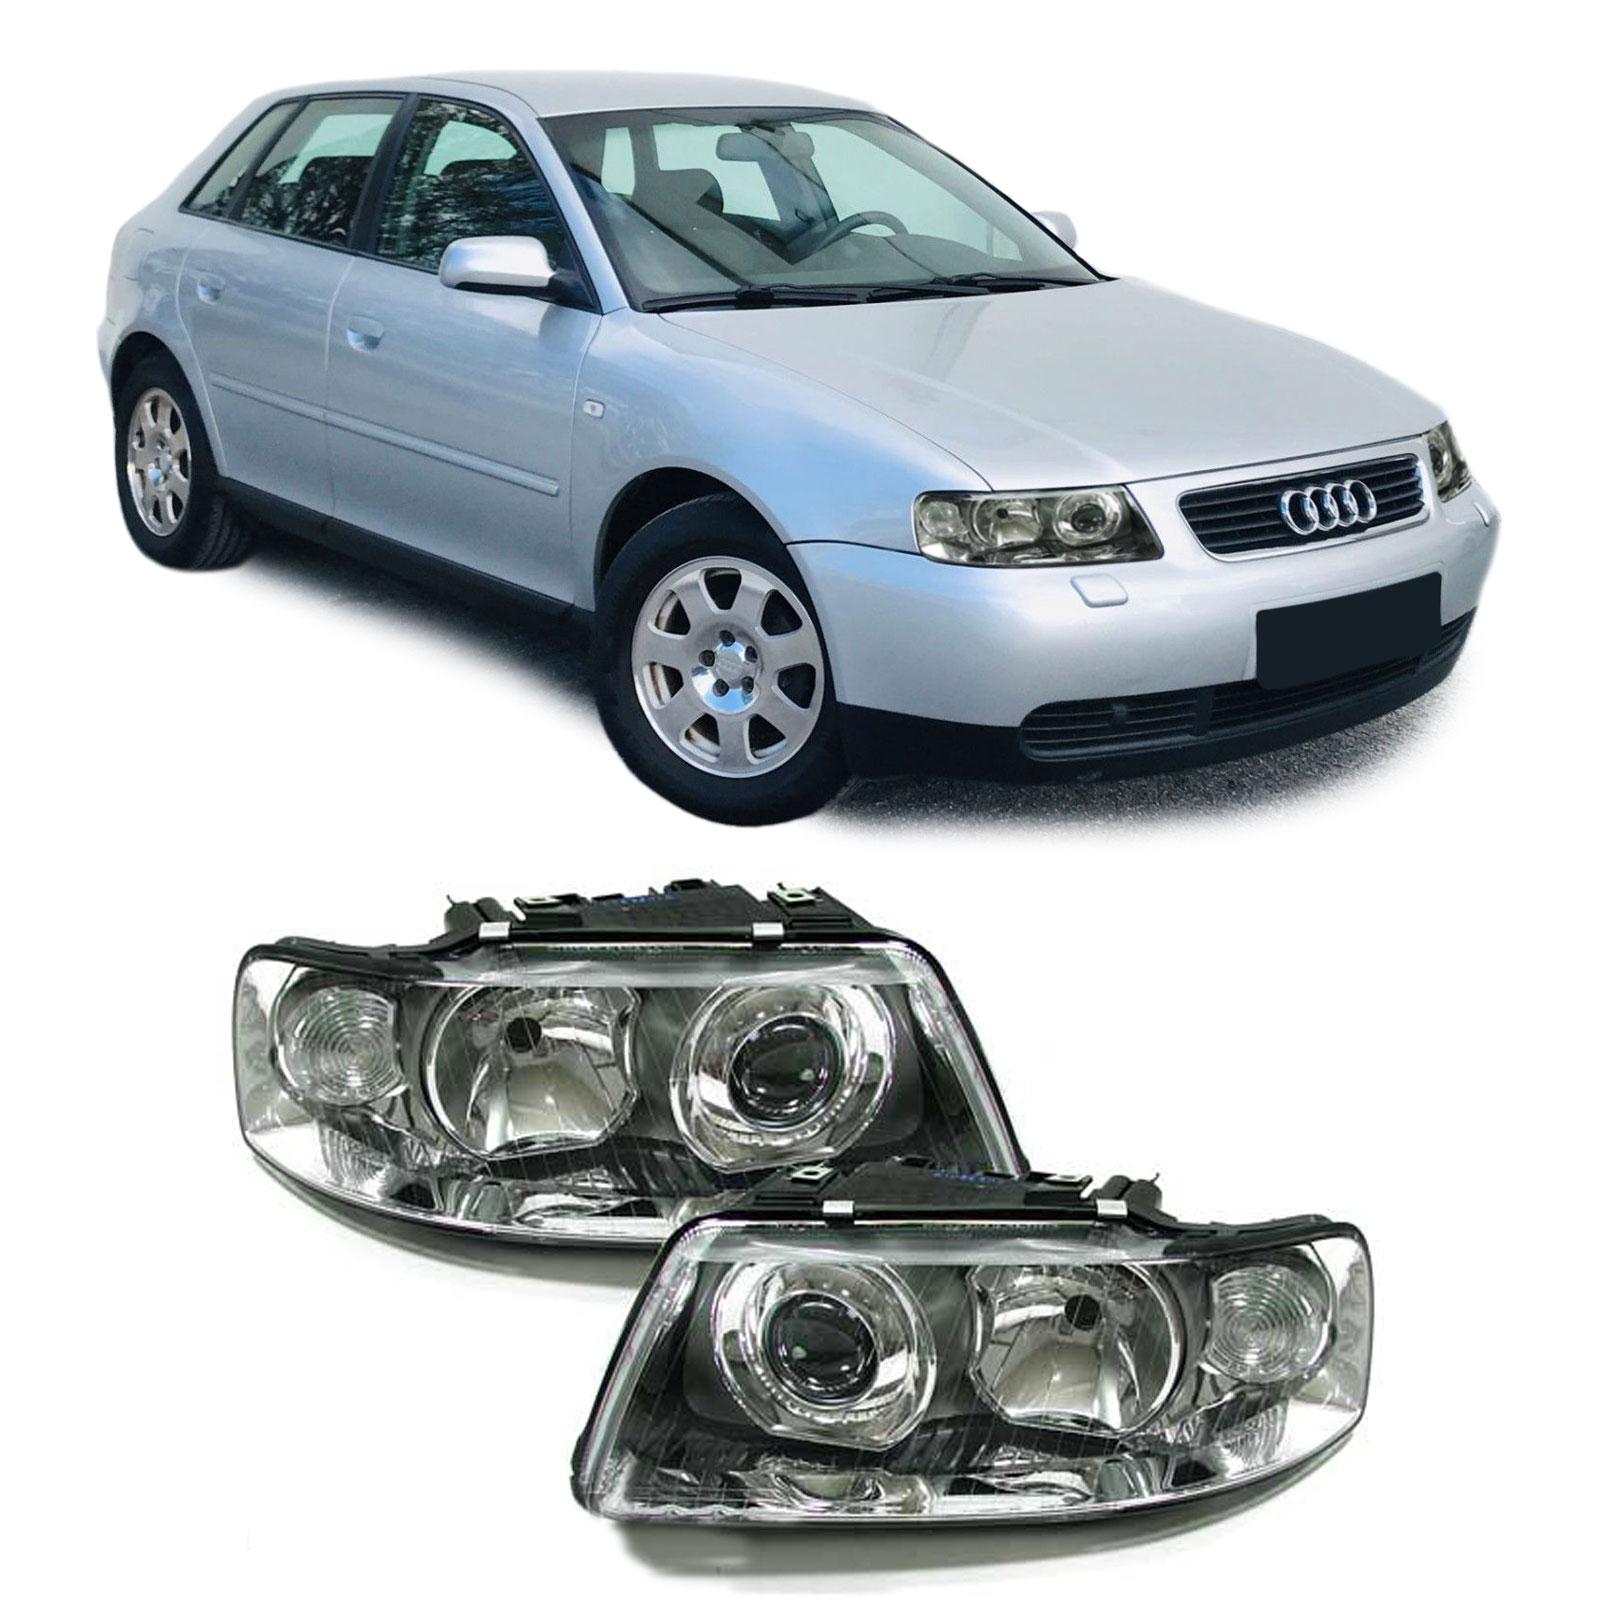 Audi-A3-FACELIFT-DE-H7-H1-KLARGLAS-SCHEINWERFER-PAAR